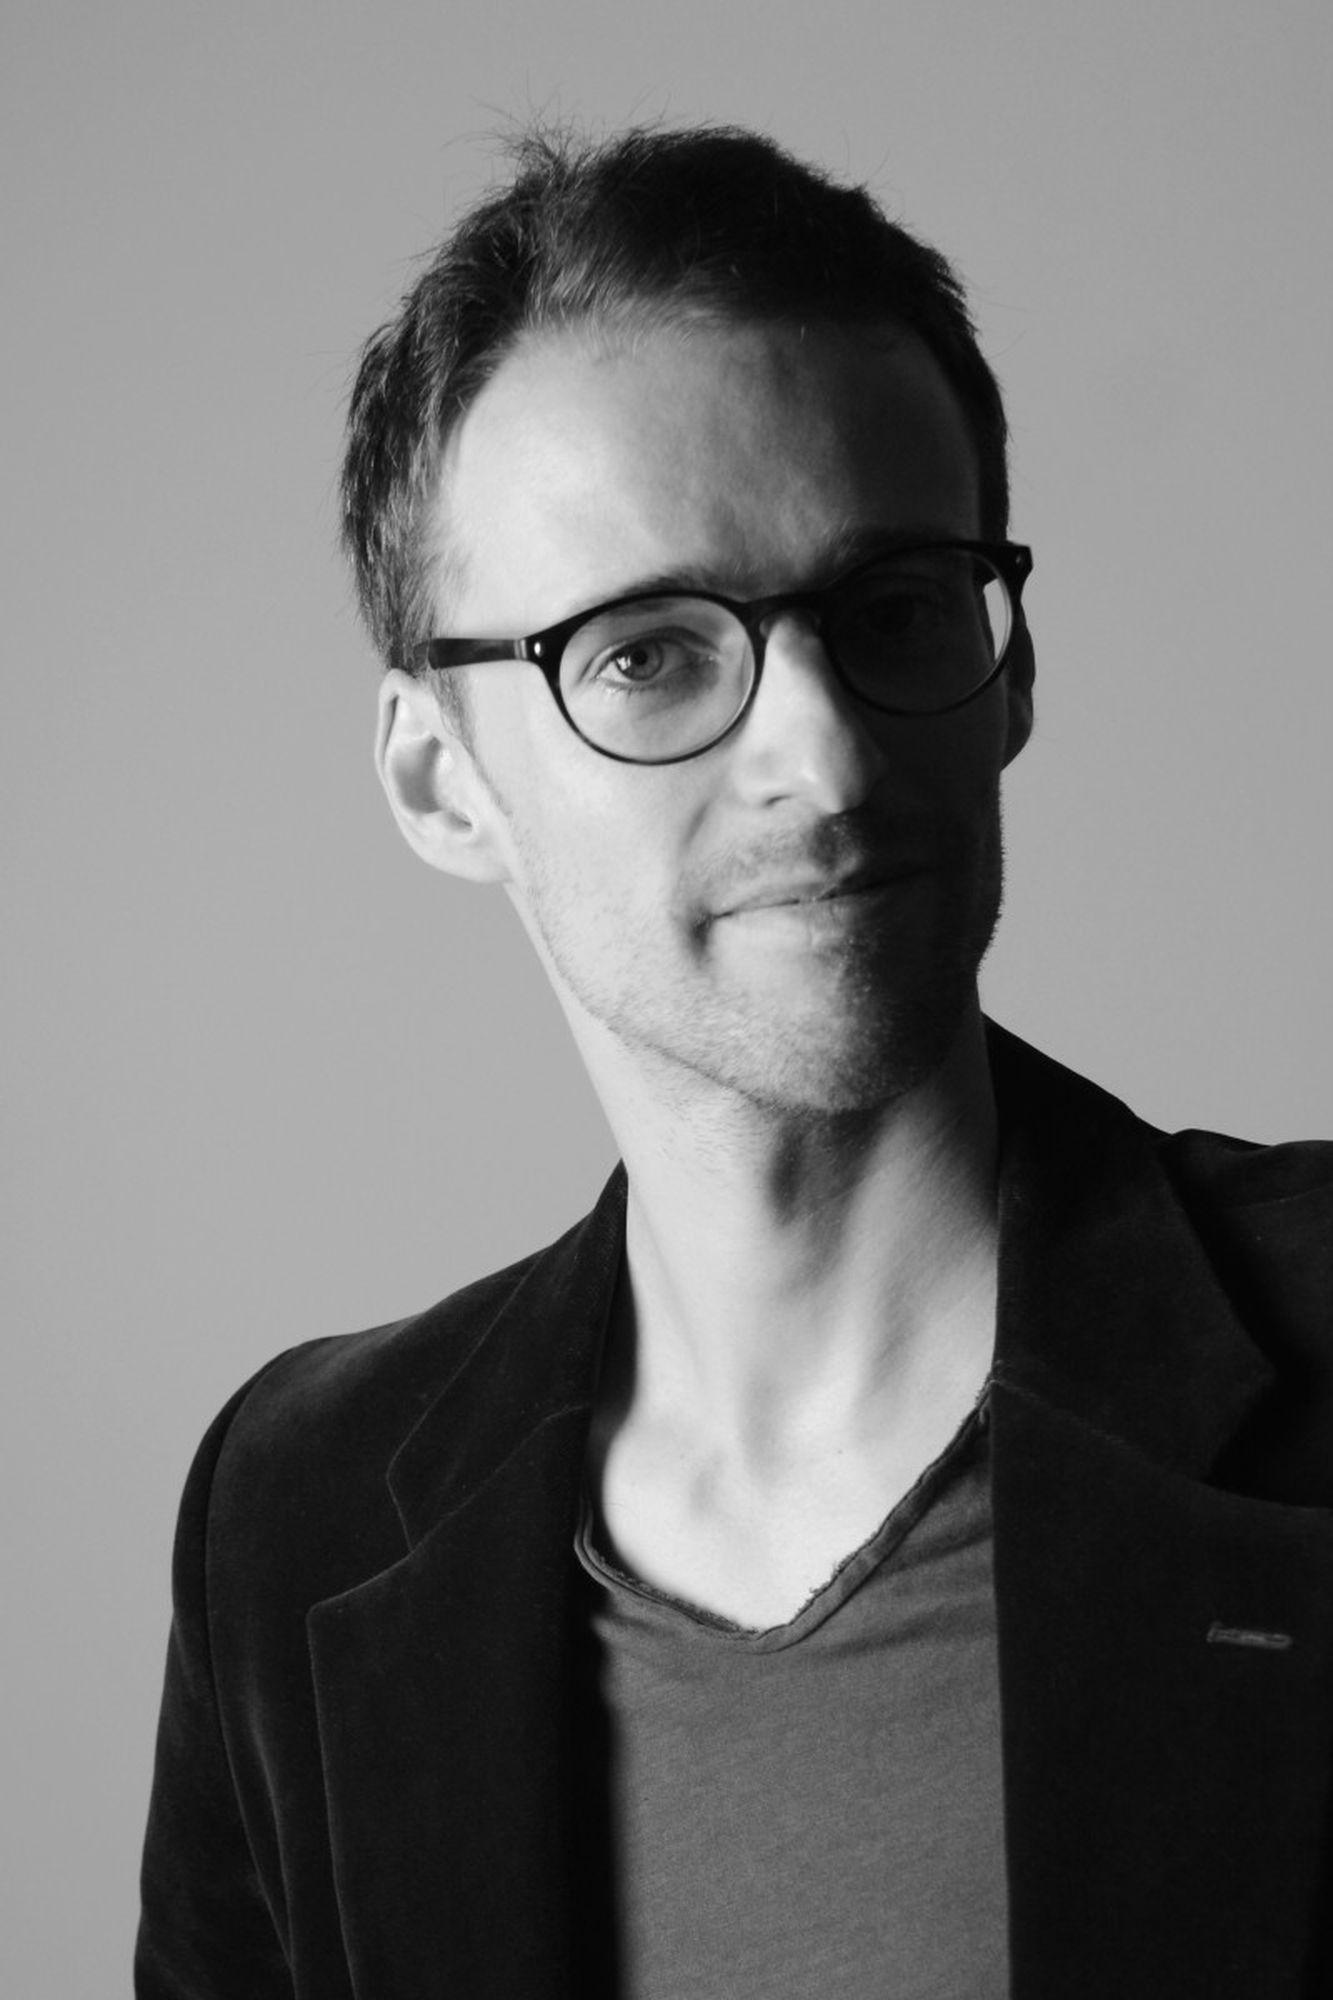 Yann Dubost